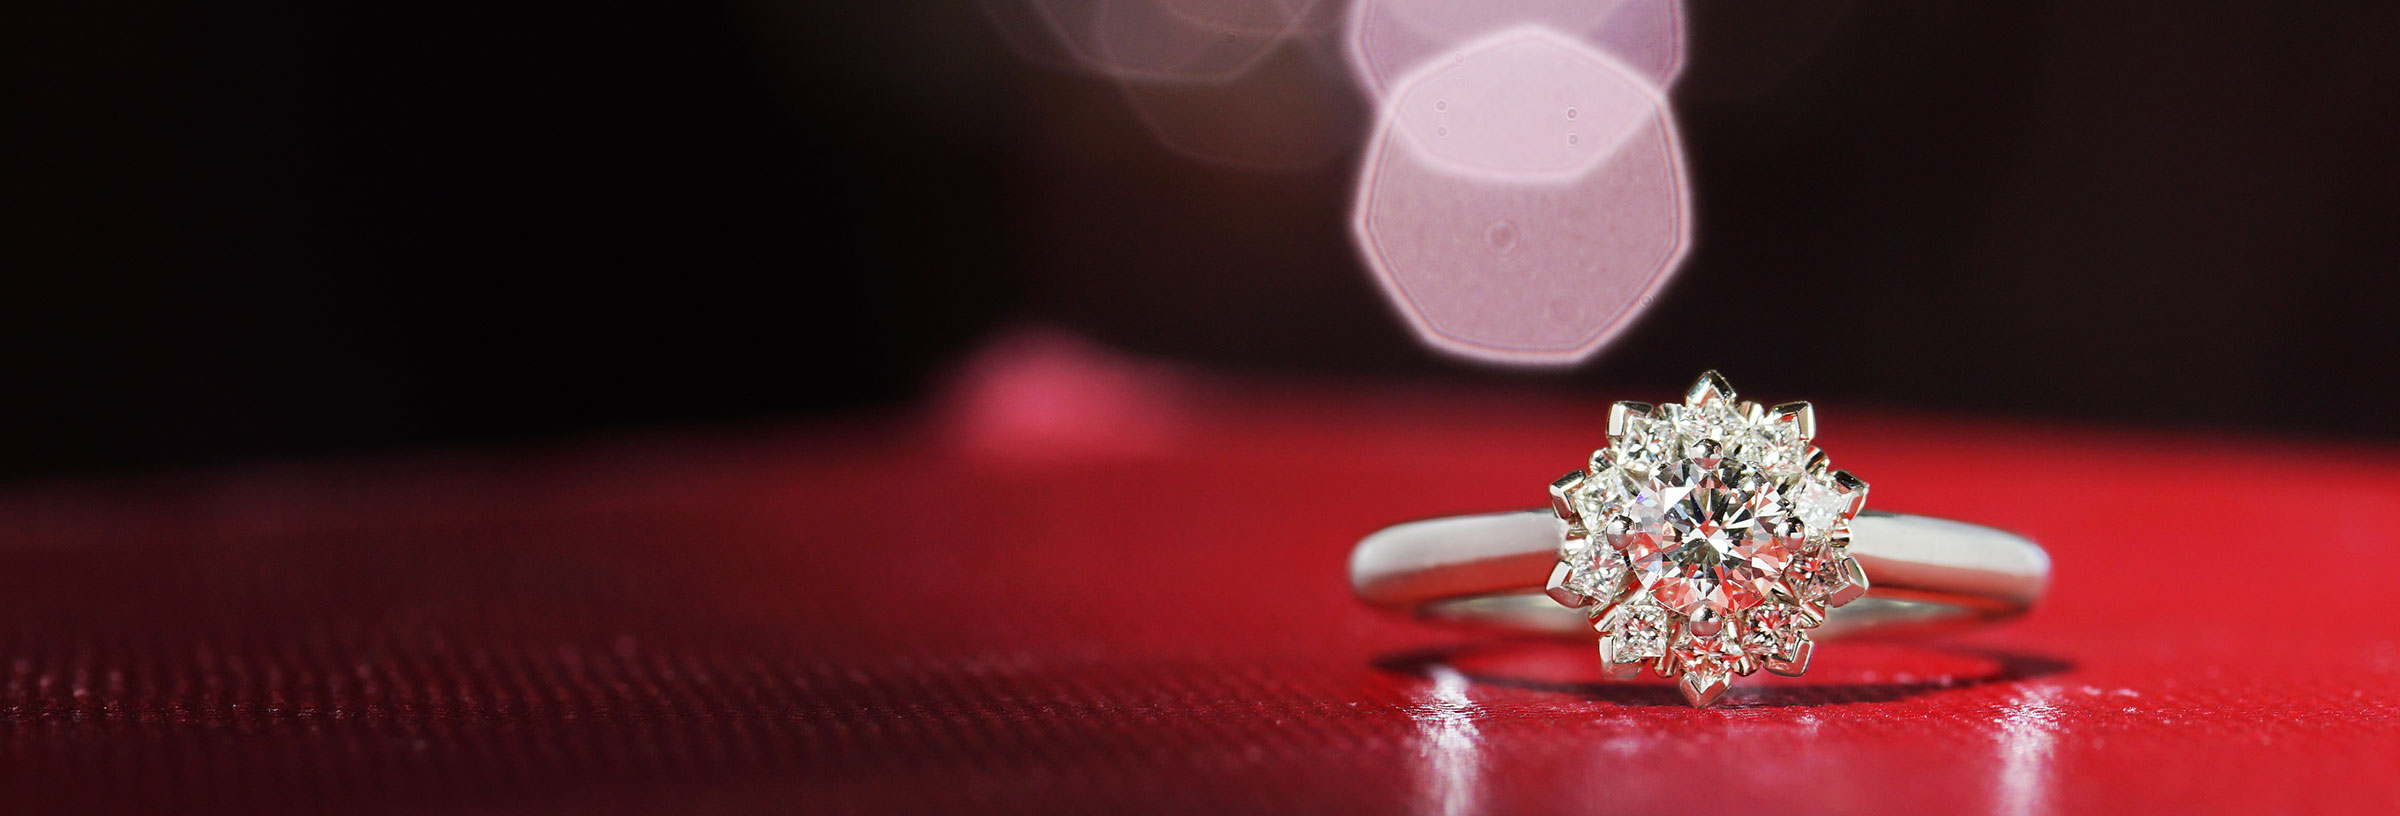 palladium-engagement-ring-with-cluster-halo-design